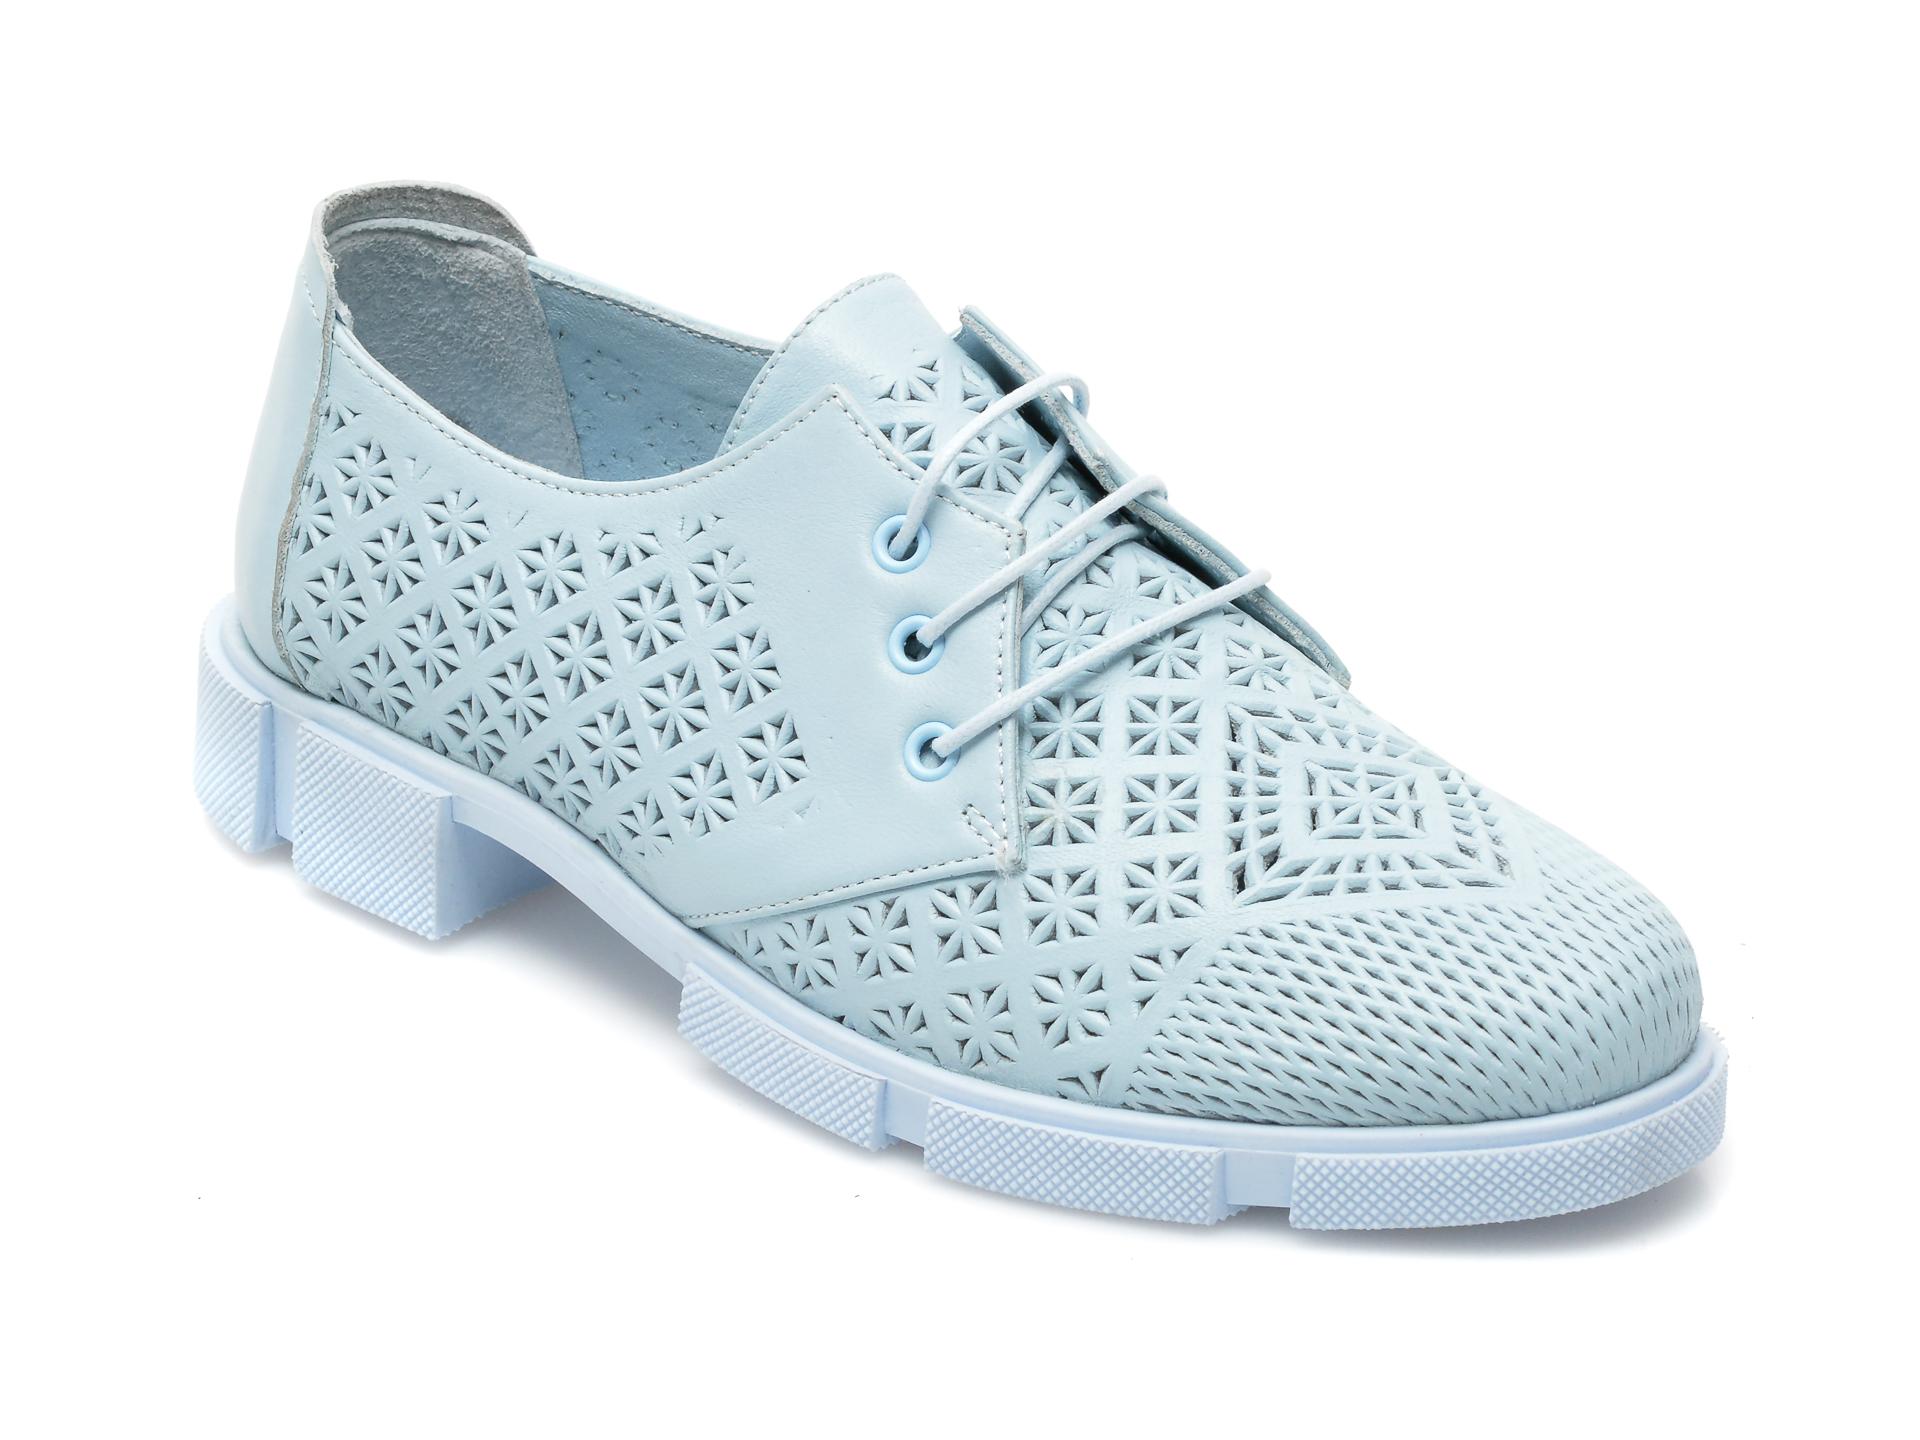 Pantofi MOLLY BESSA albastri, MN106, din piele naturala